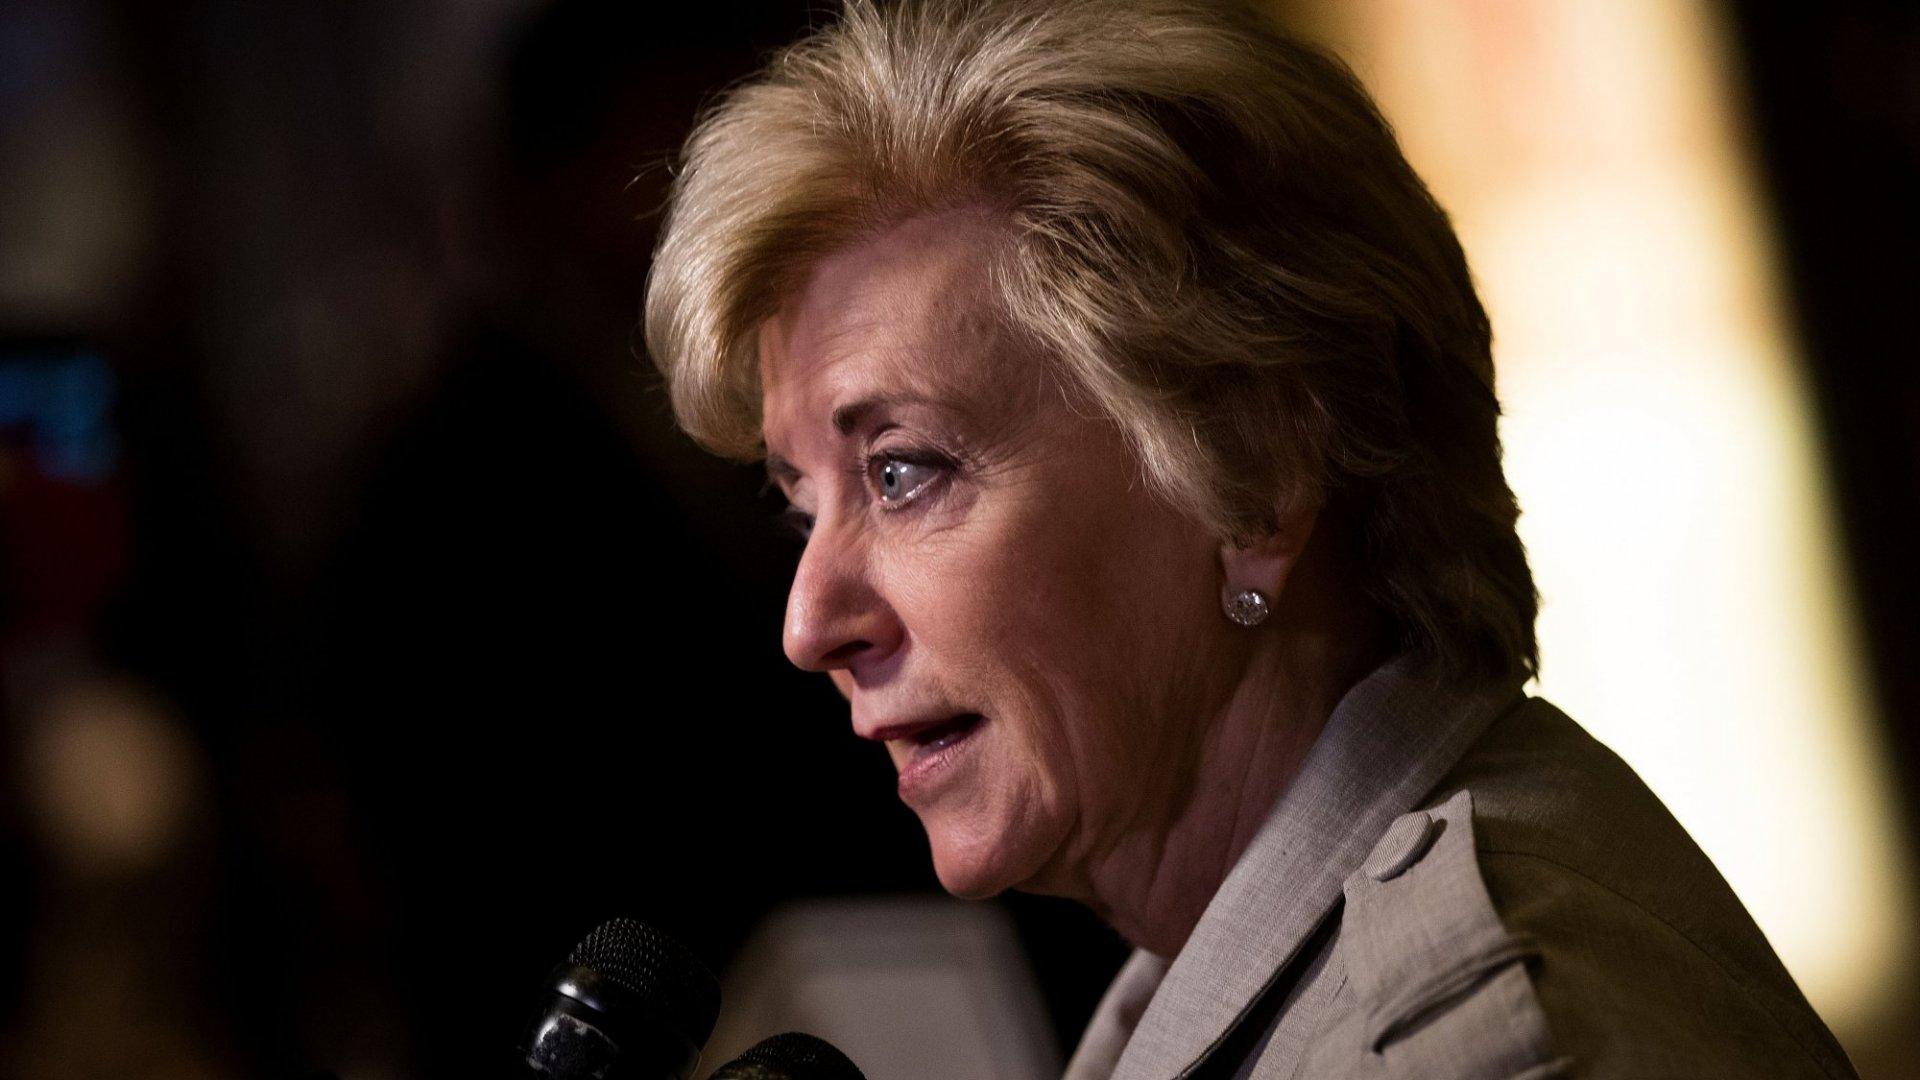 Trump Picks Former Wrestling Executive Linda McMahon to Lead SBA